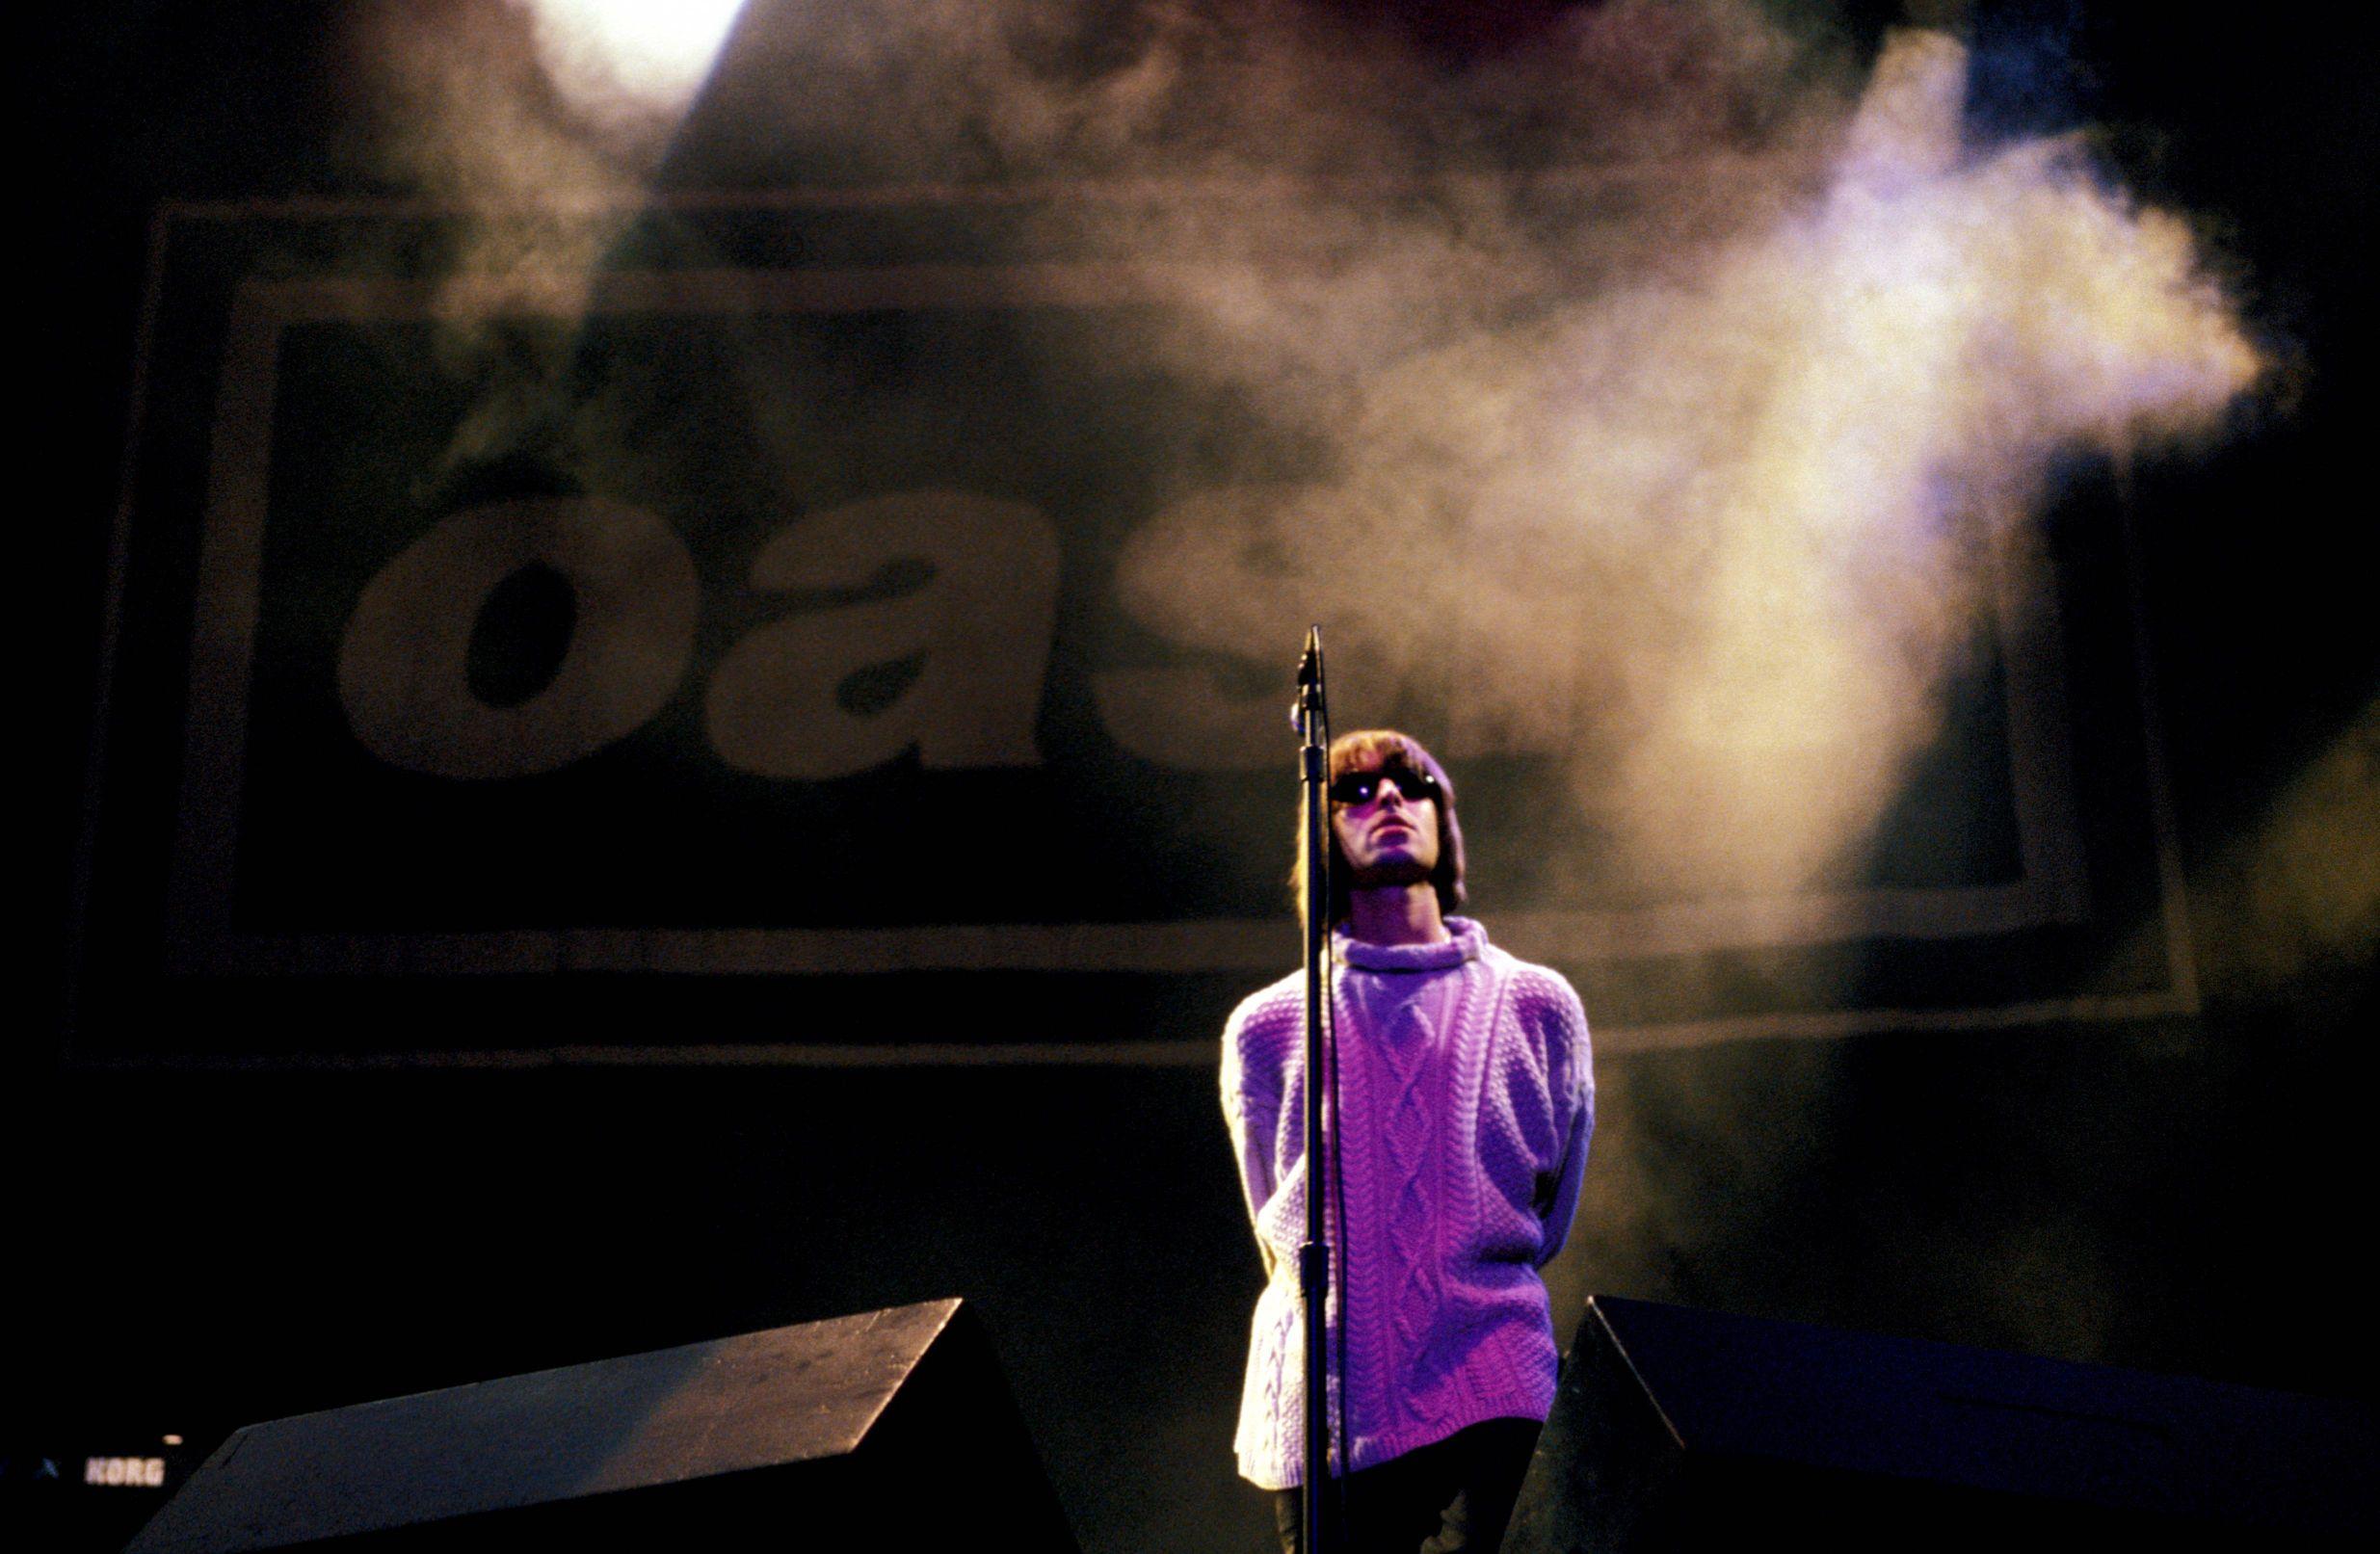 oasis-album-e-tour---immagini-Credit_Roberta_Parkin.Redferns_GettyImages-86098407_m.jpg